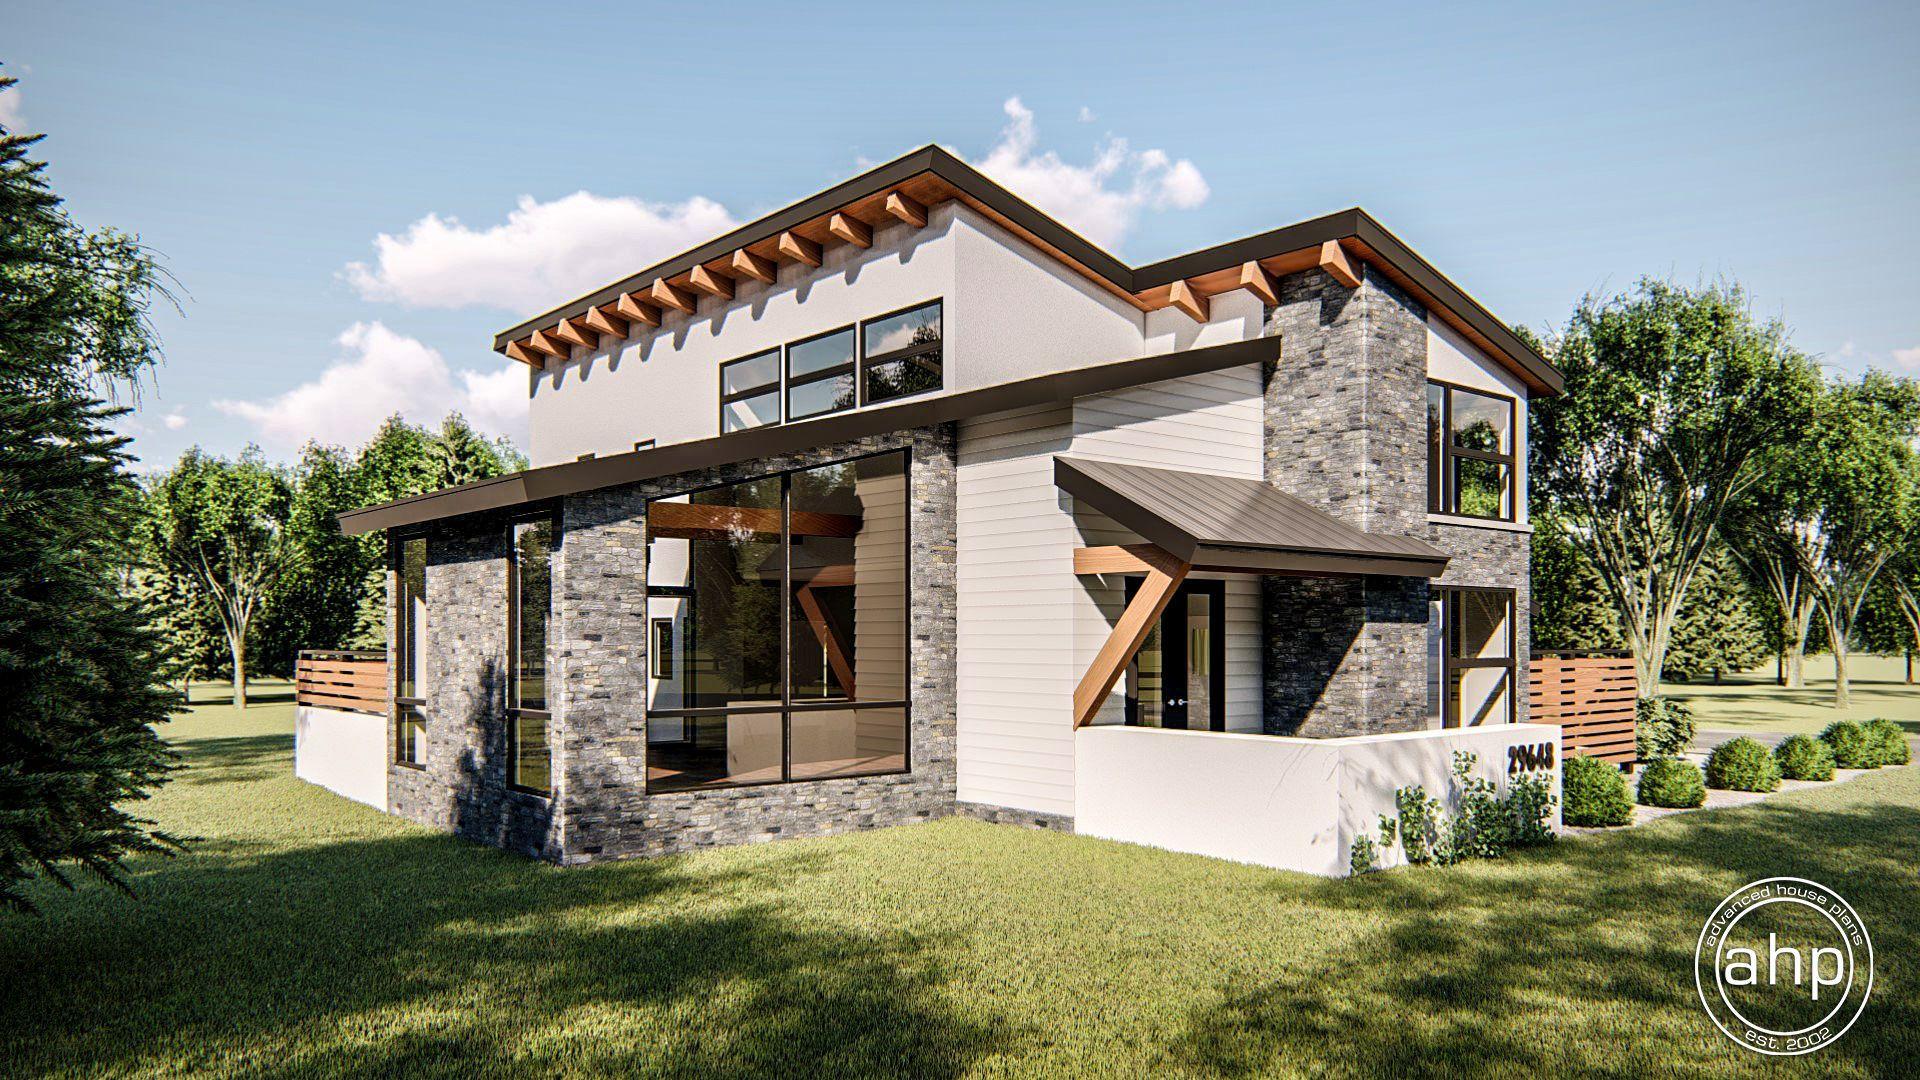 Regency 1.5 Story Modern House Plan | Modern house plan ...